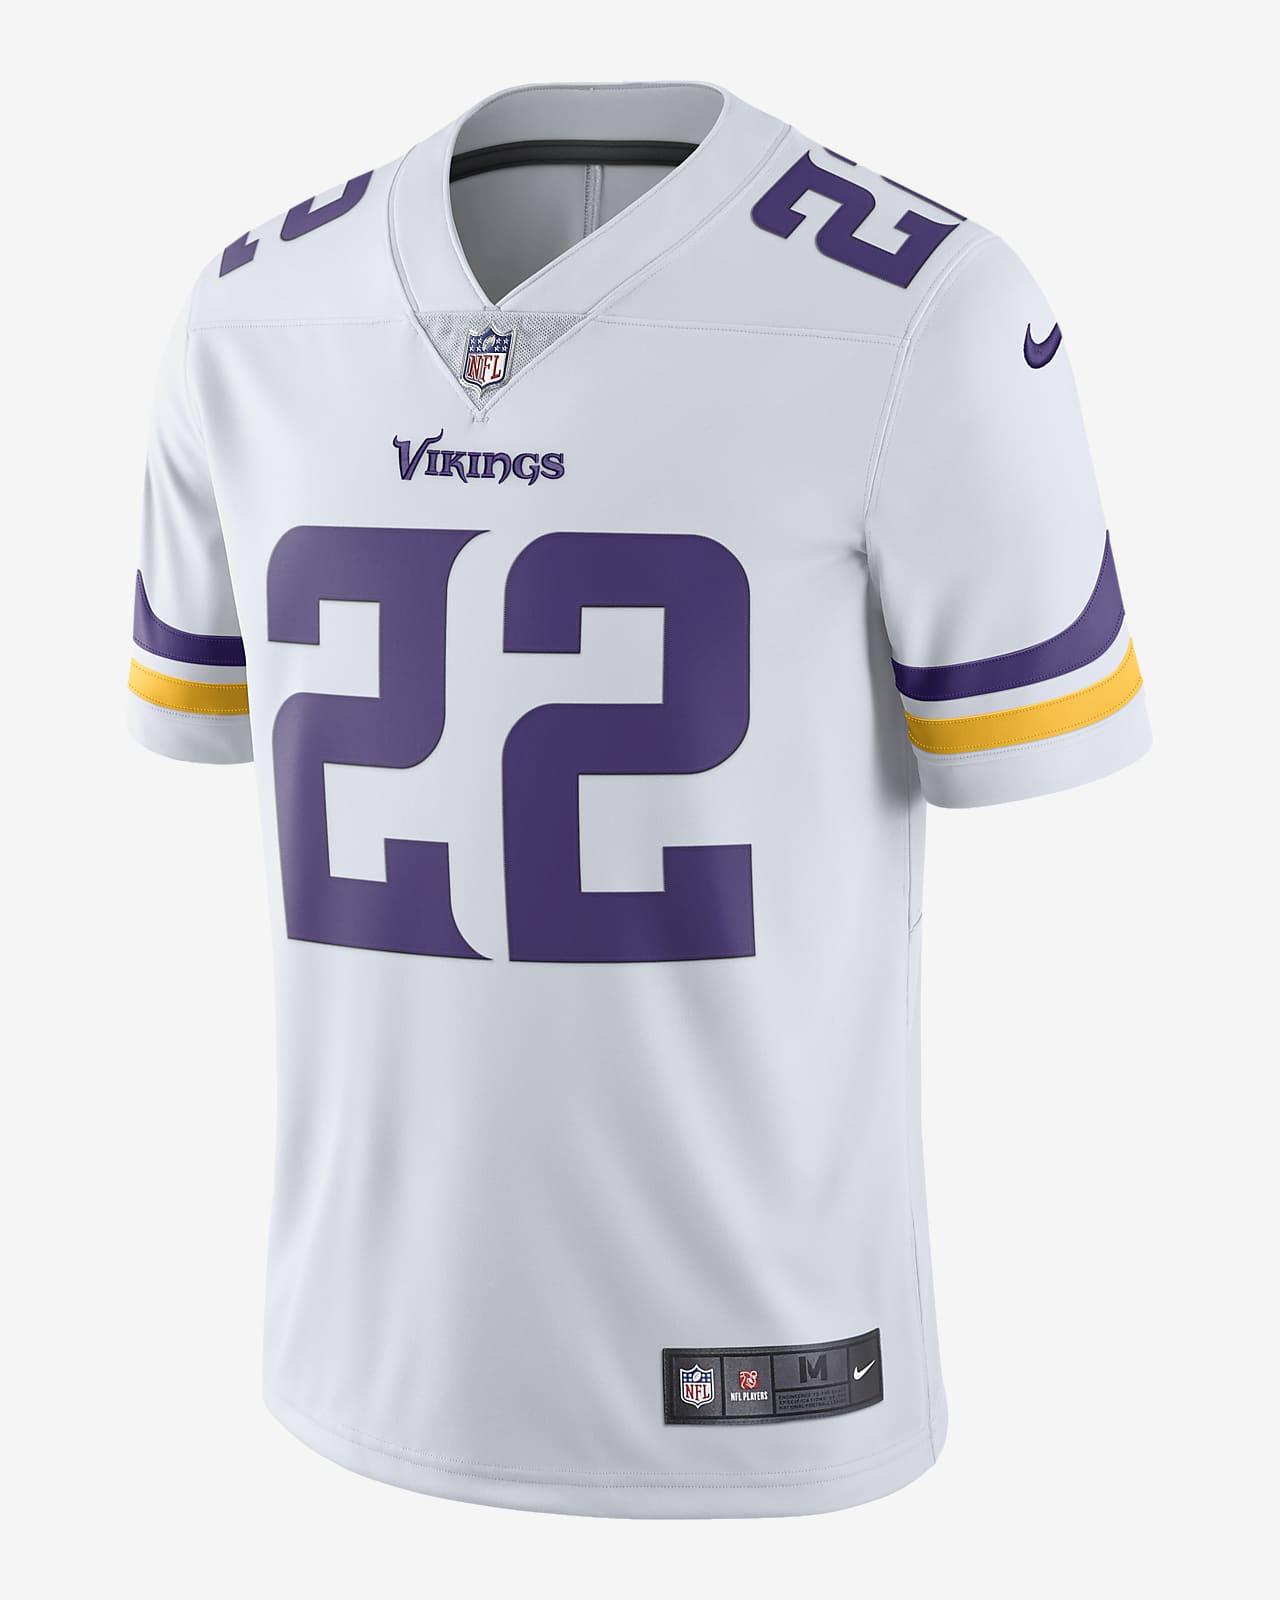 Camiseta de fútbol americano Limited Vapor Untouchable para hombre NFL Minnesota Vikings (Harrison Smith)